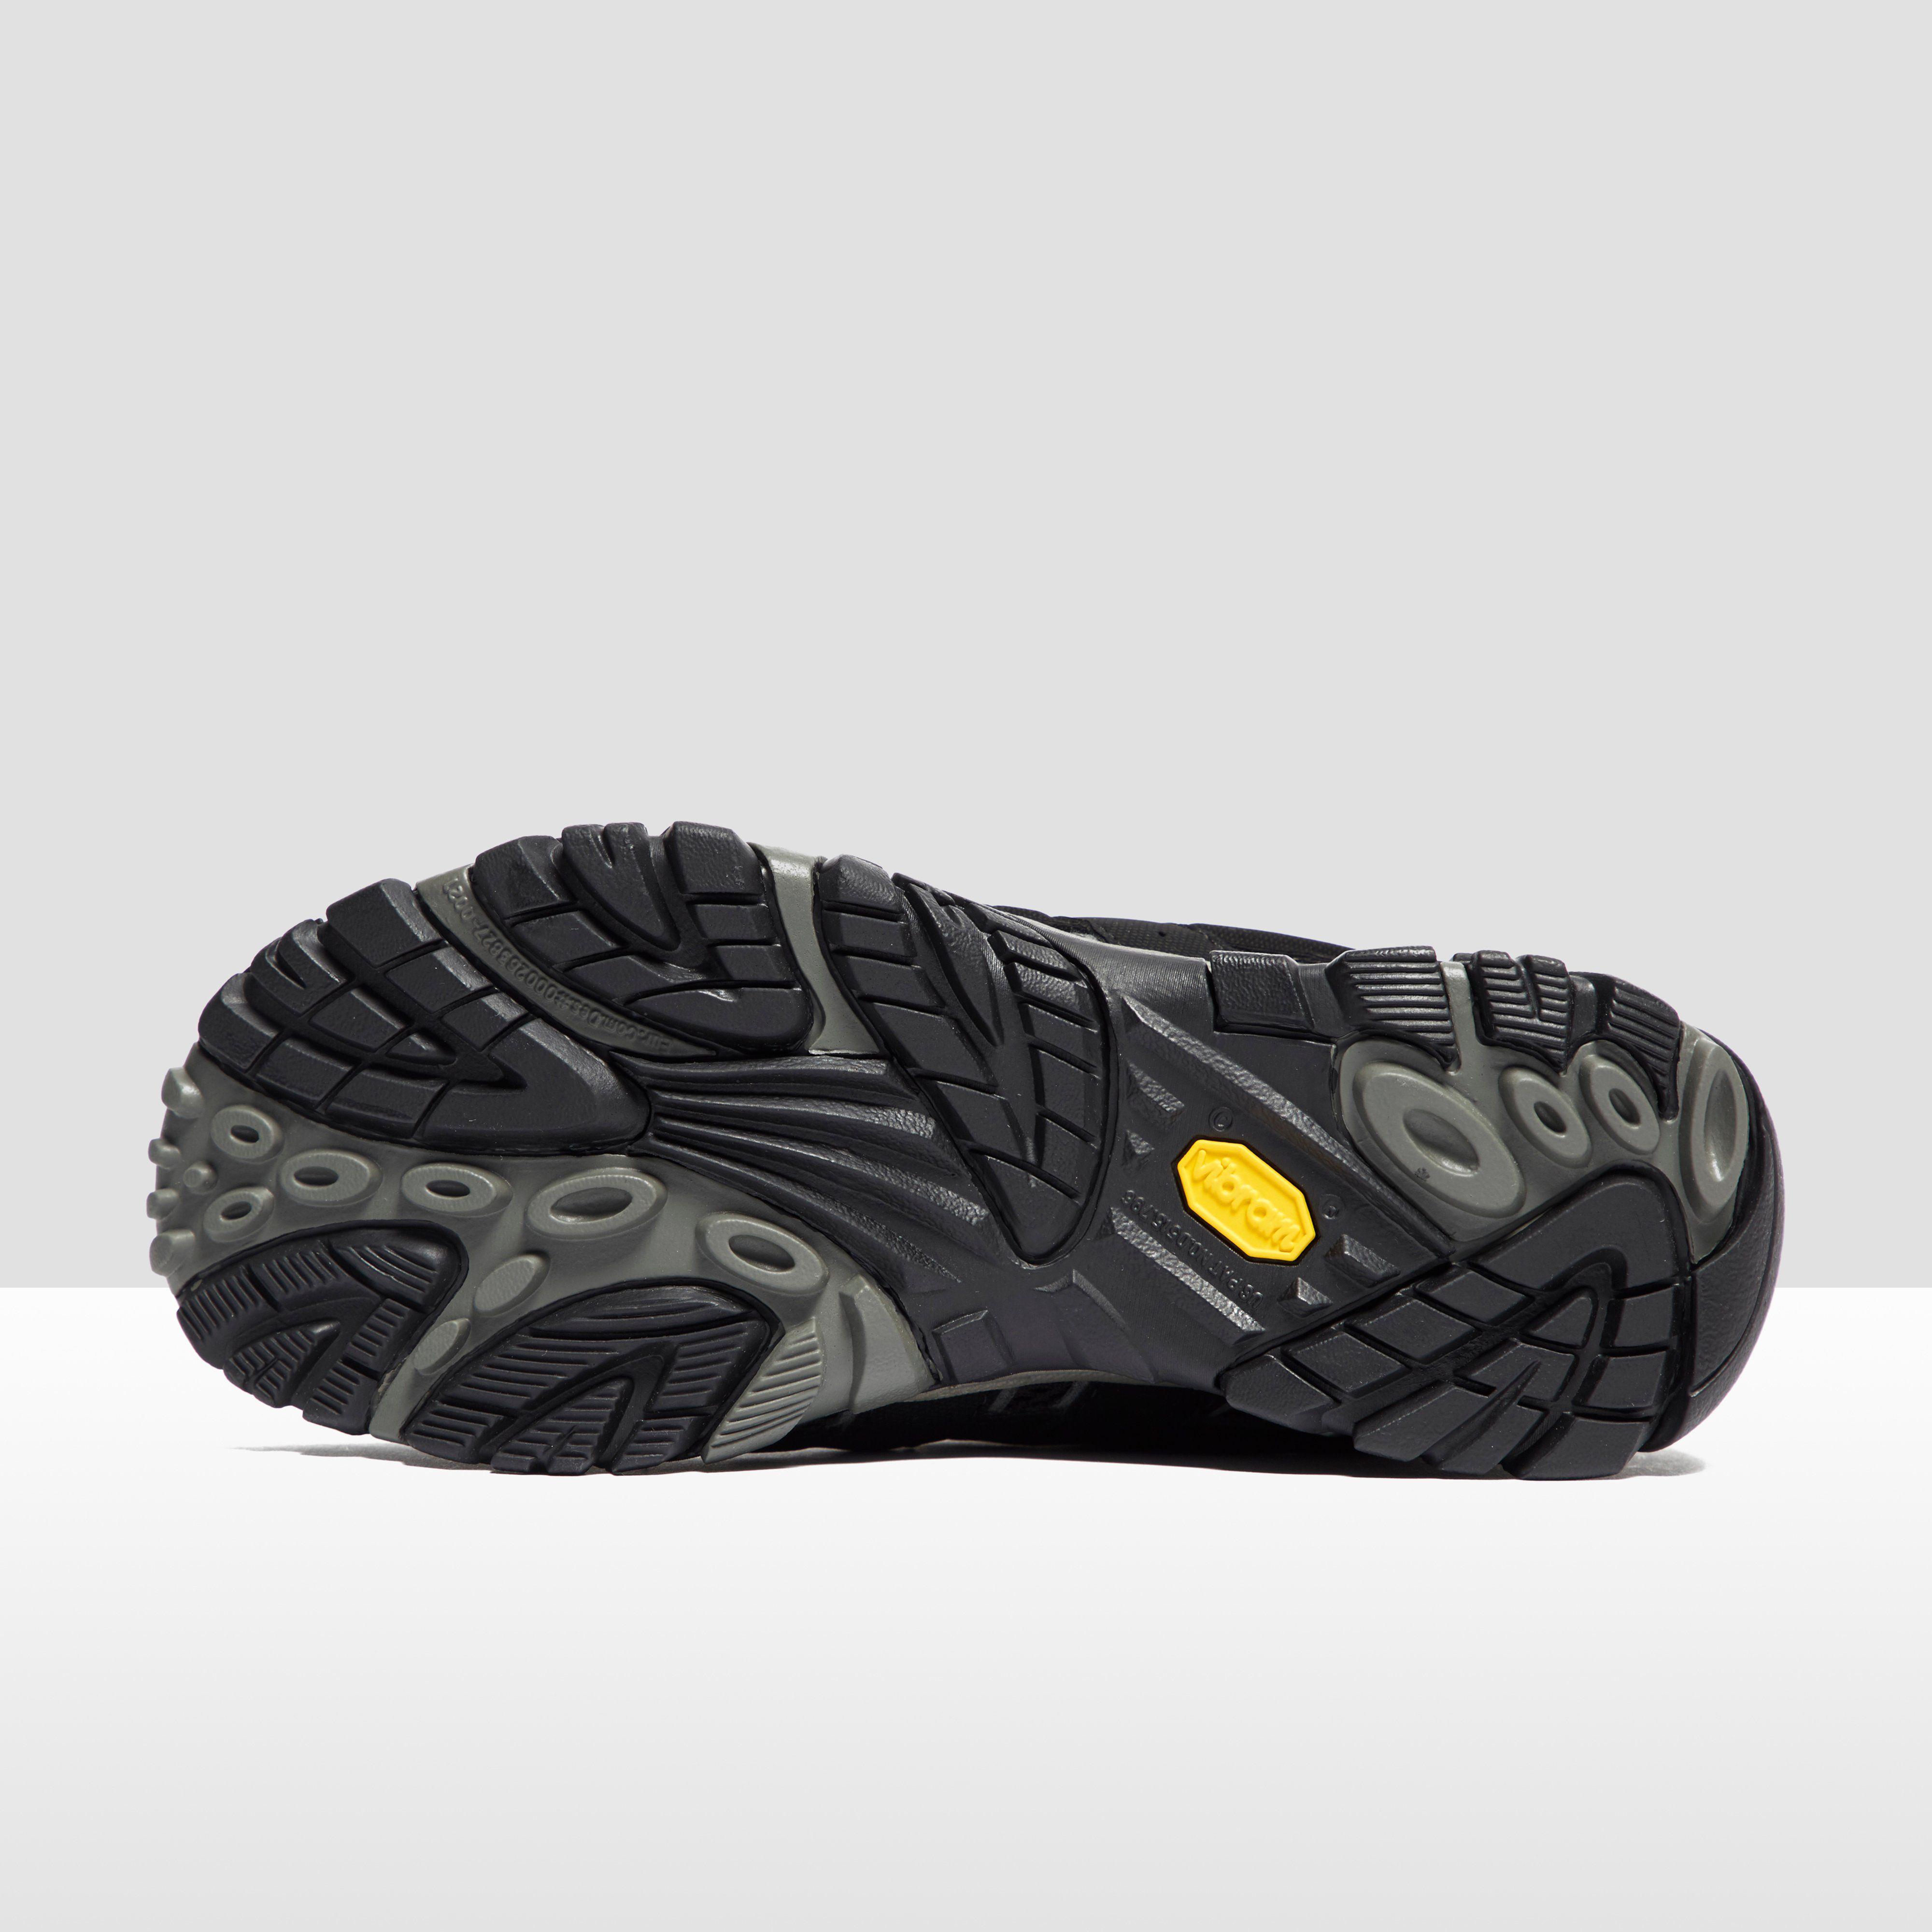 Merrell MOAB GORE-TEX Men's Hiking Shoes